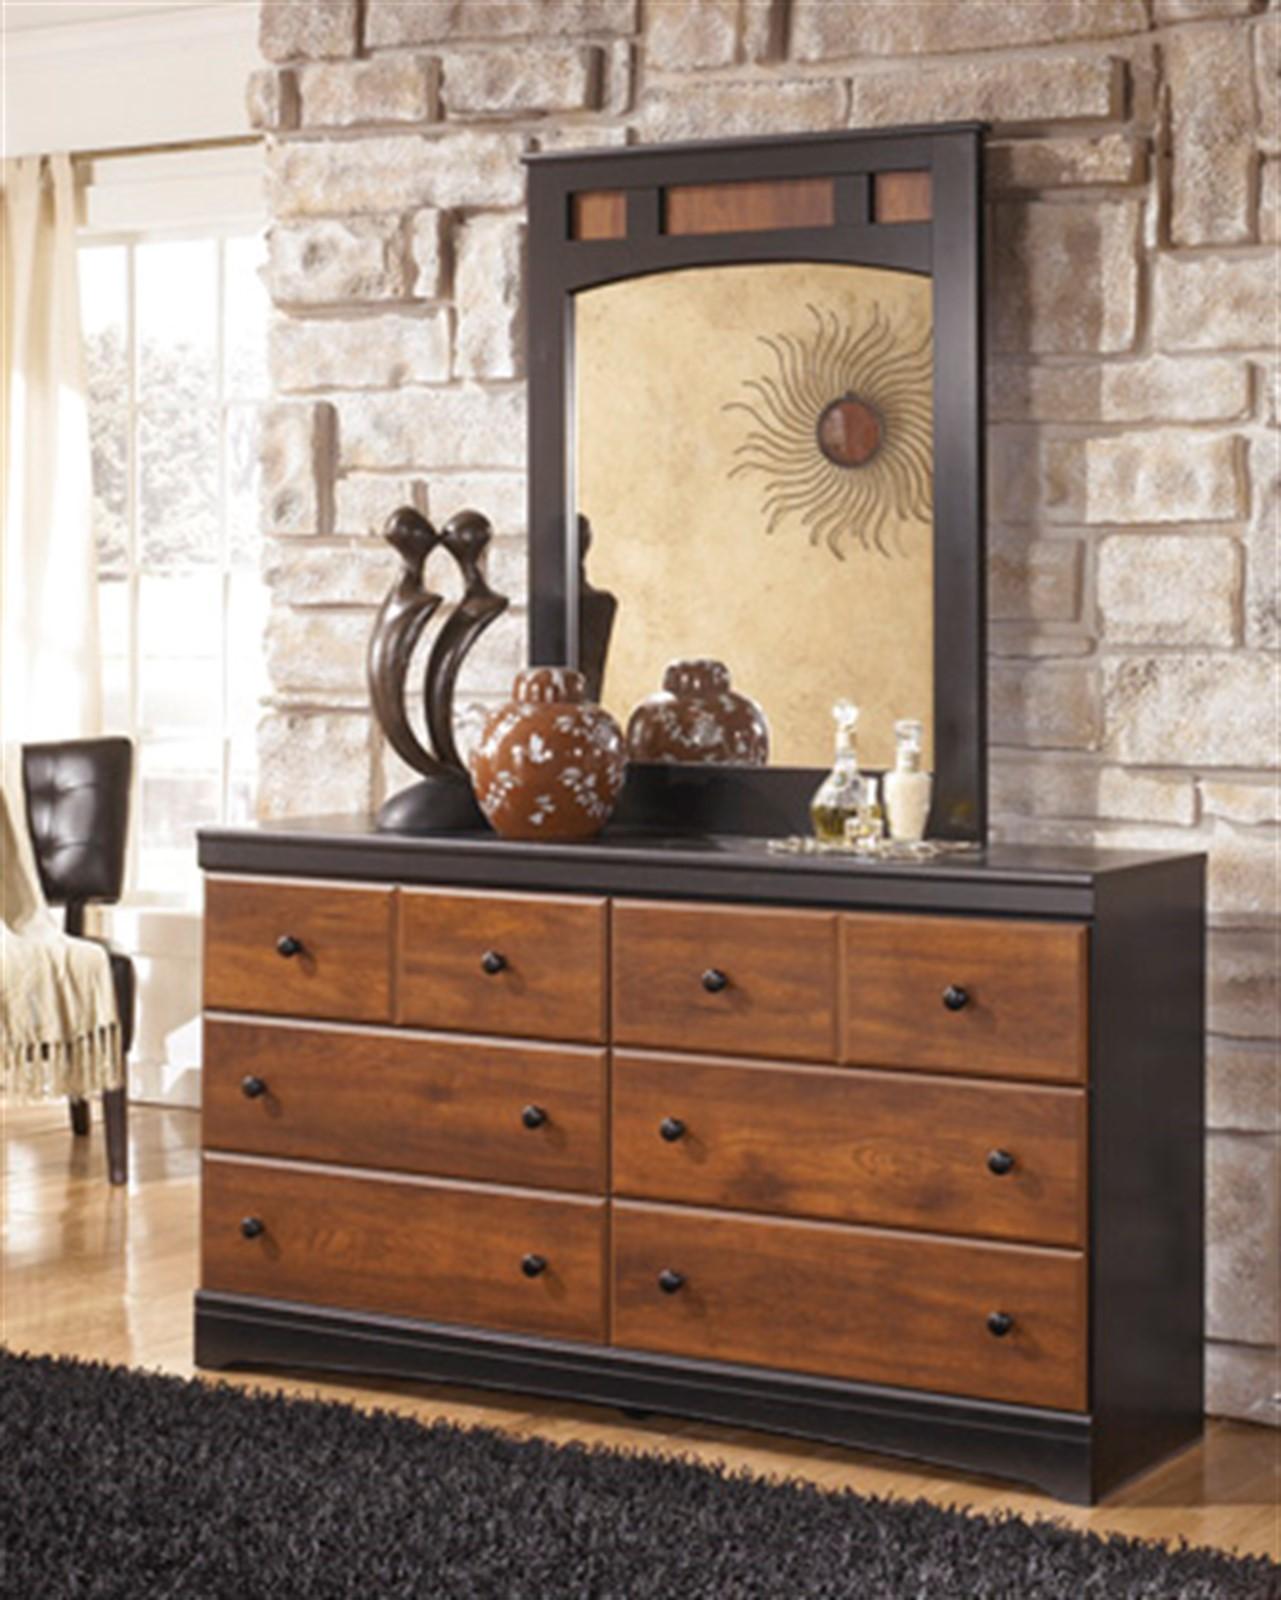 Aimwell Dresser and Mirror Set - Dark Brown